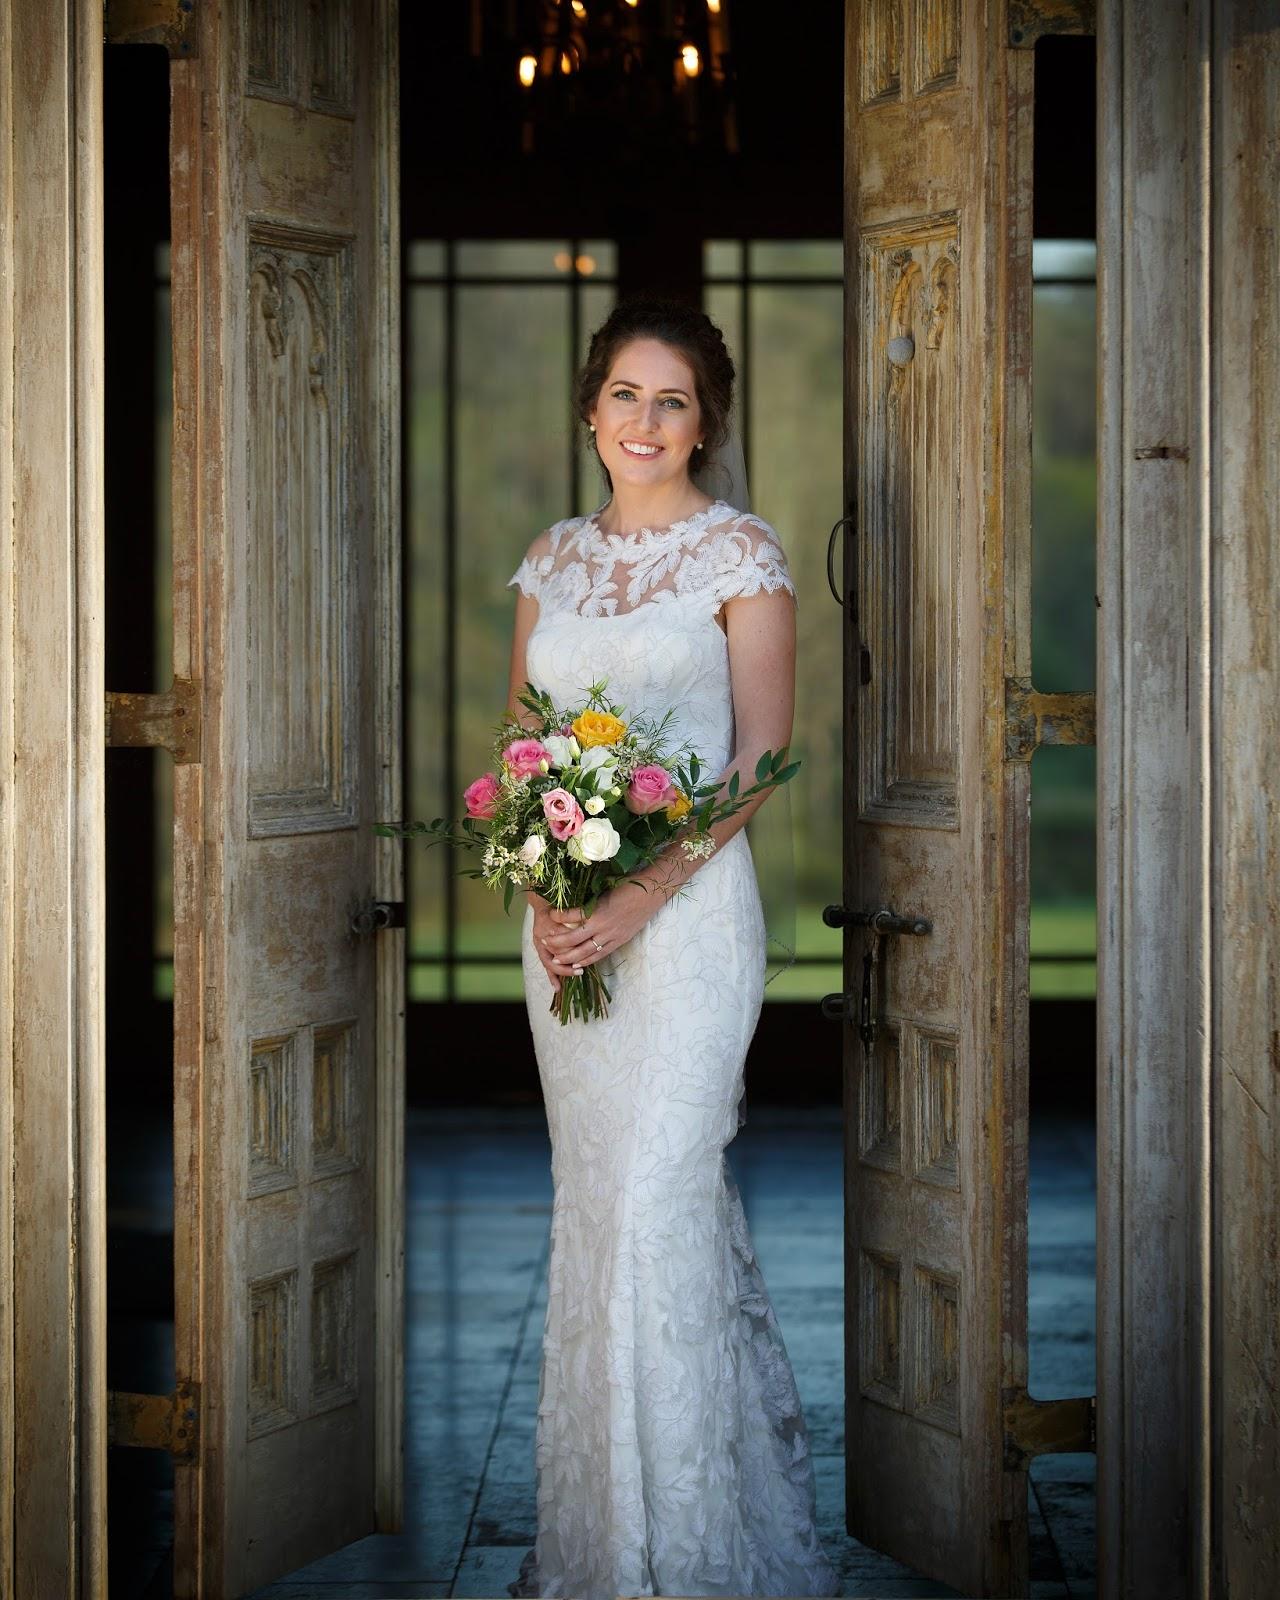 Cable Photography & Video: Rebecca Danehy Clark - Wedding ...